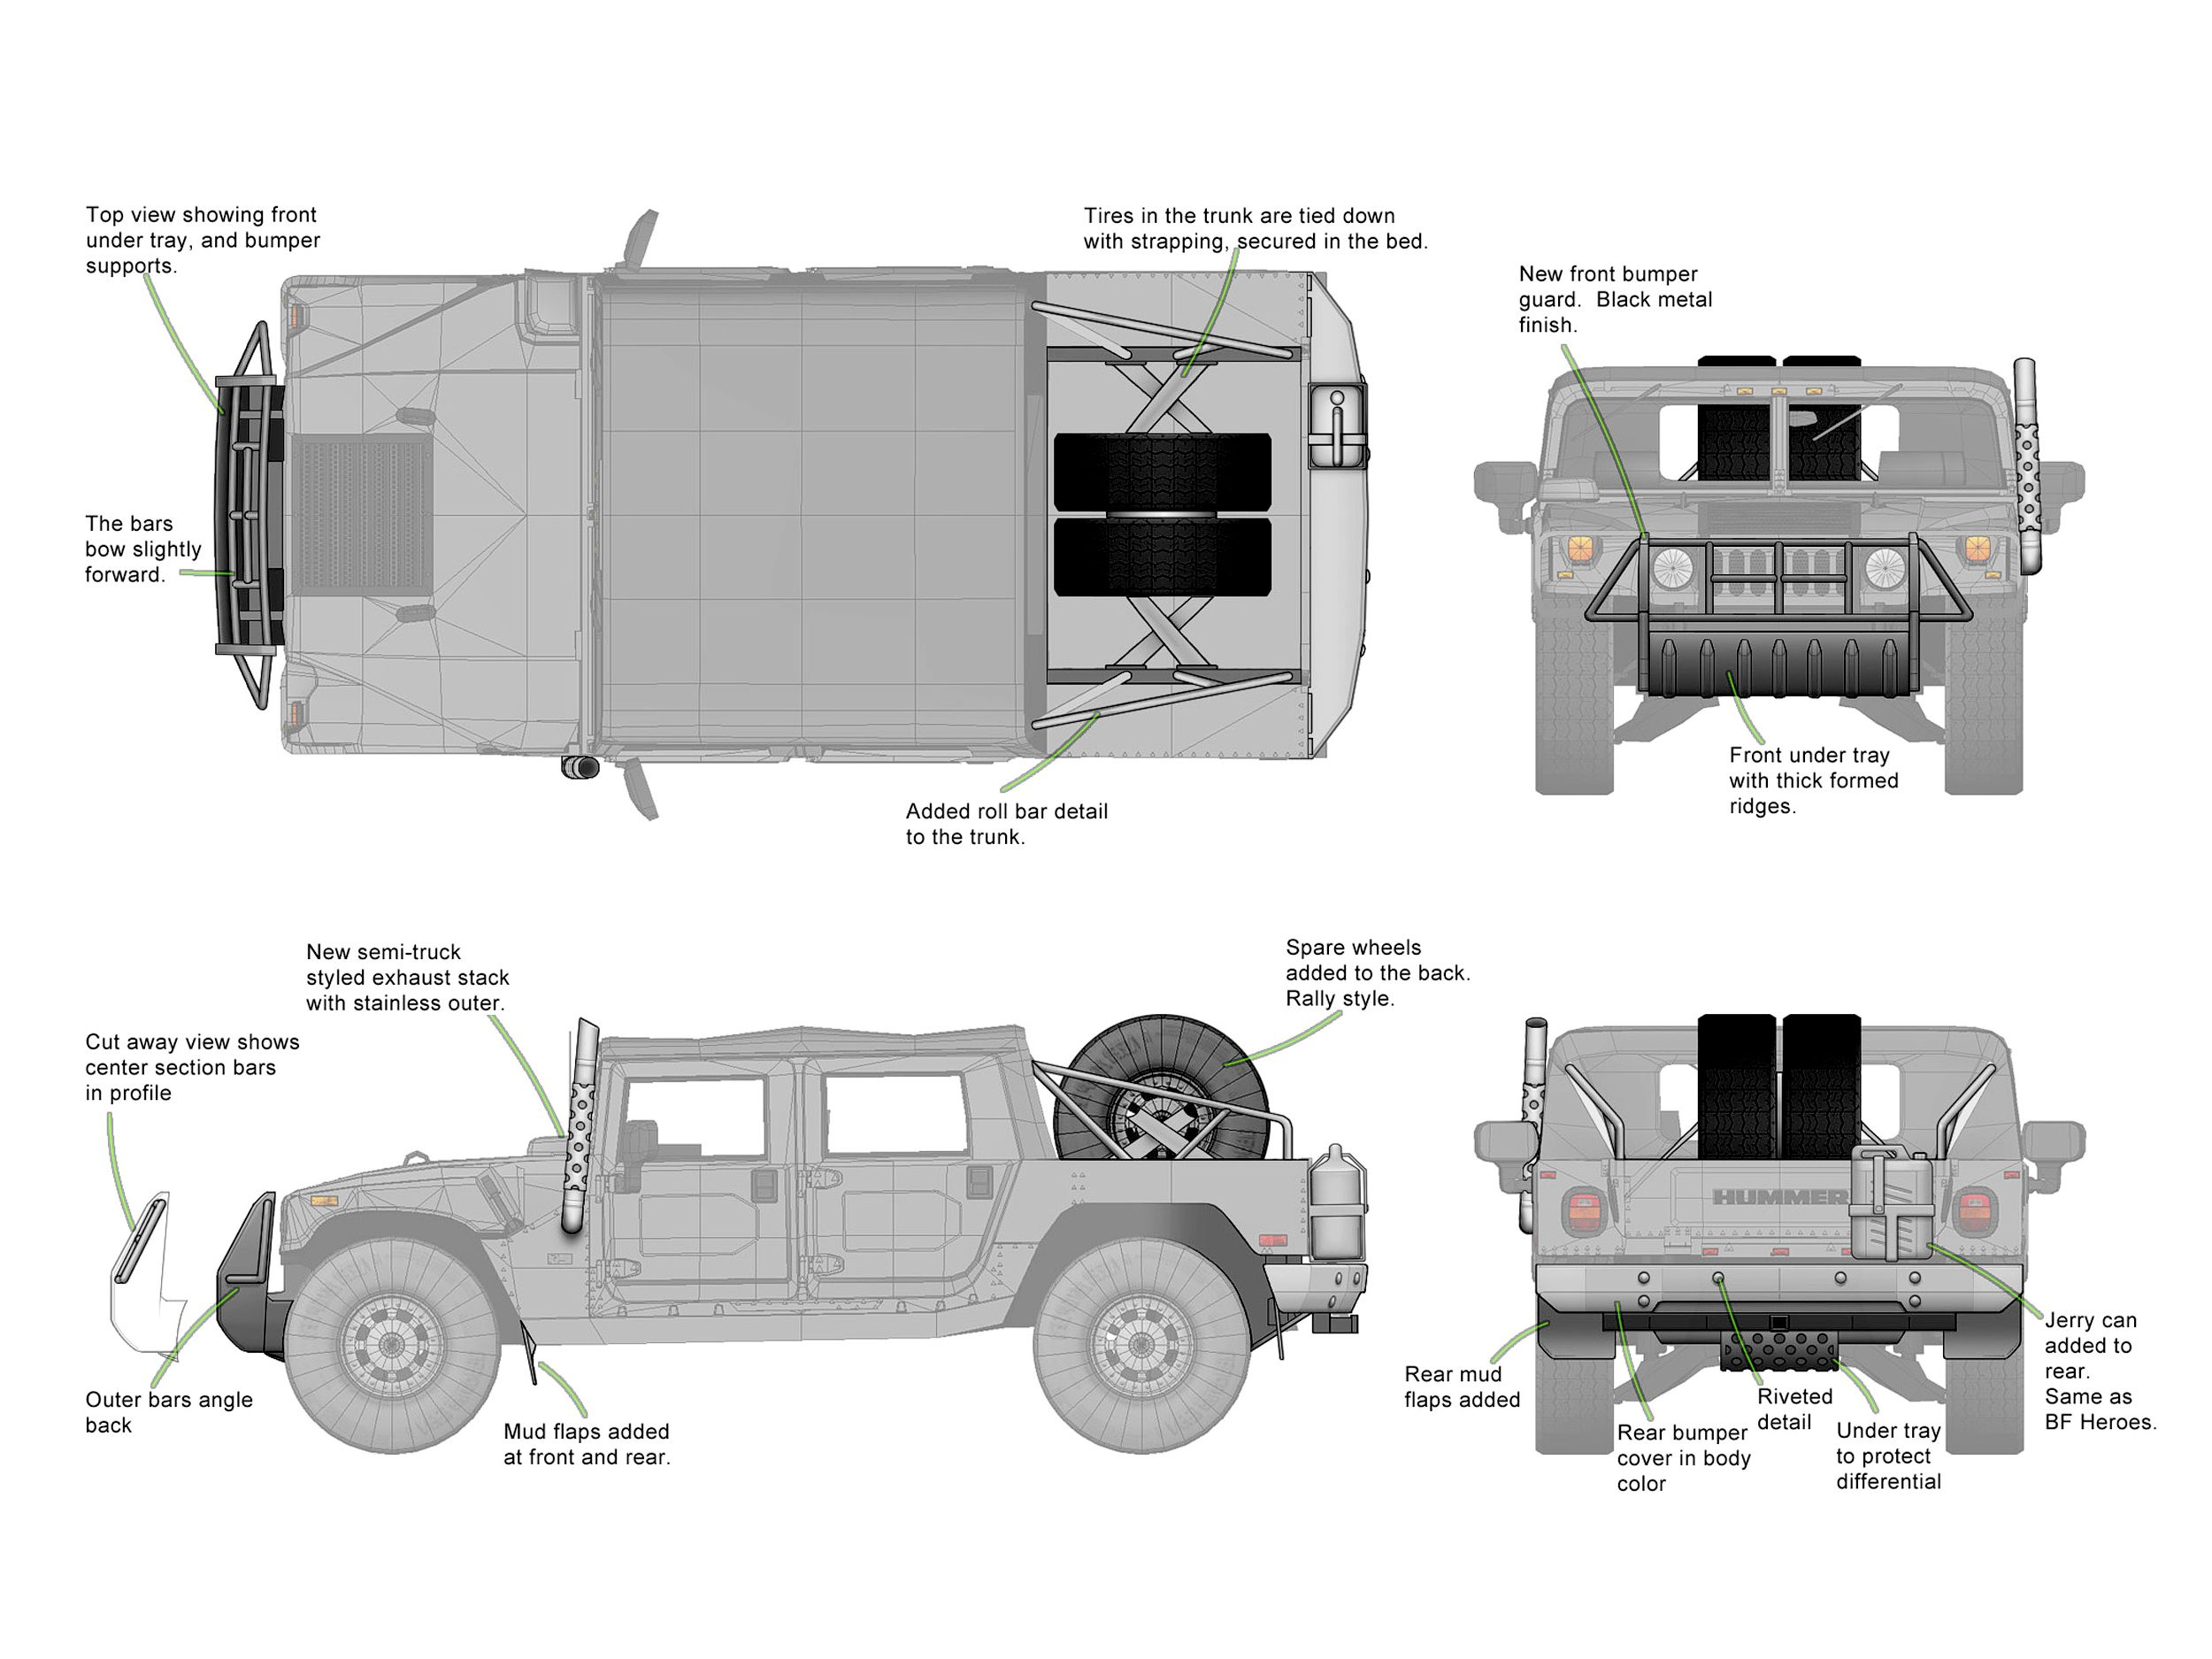 referencia ortogonal blueprint Hummer H1 para modelagem 3d by mike Hayes #hummer #3d #vehicle #modeling #military #car #jeep #referencia #vetor #drawing #cardesign #vector #blueprint #modo #maya #3dmax #c4d #blender